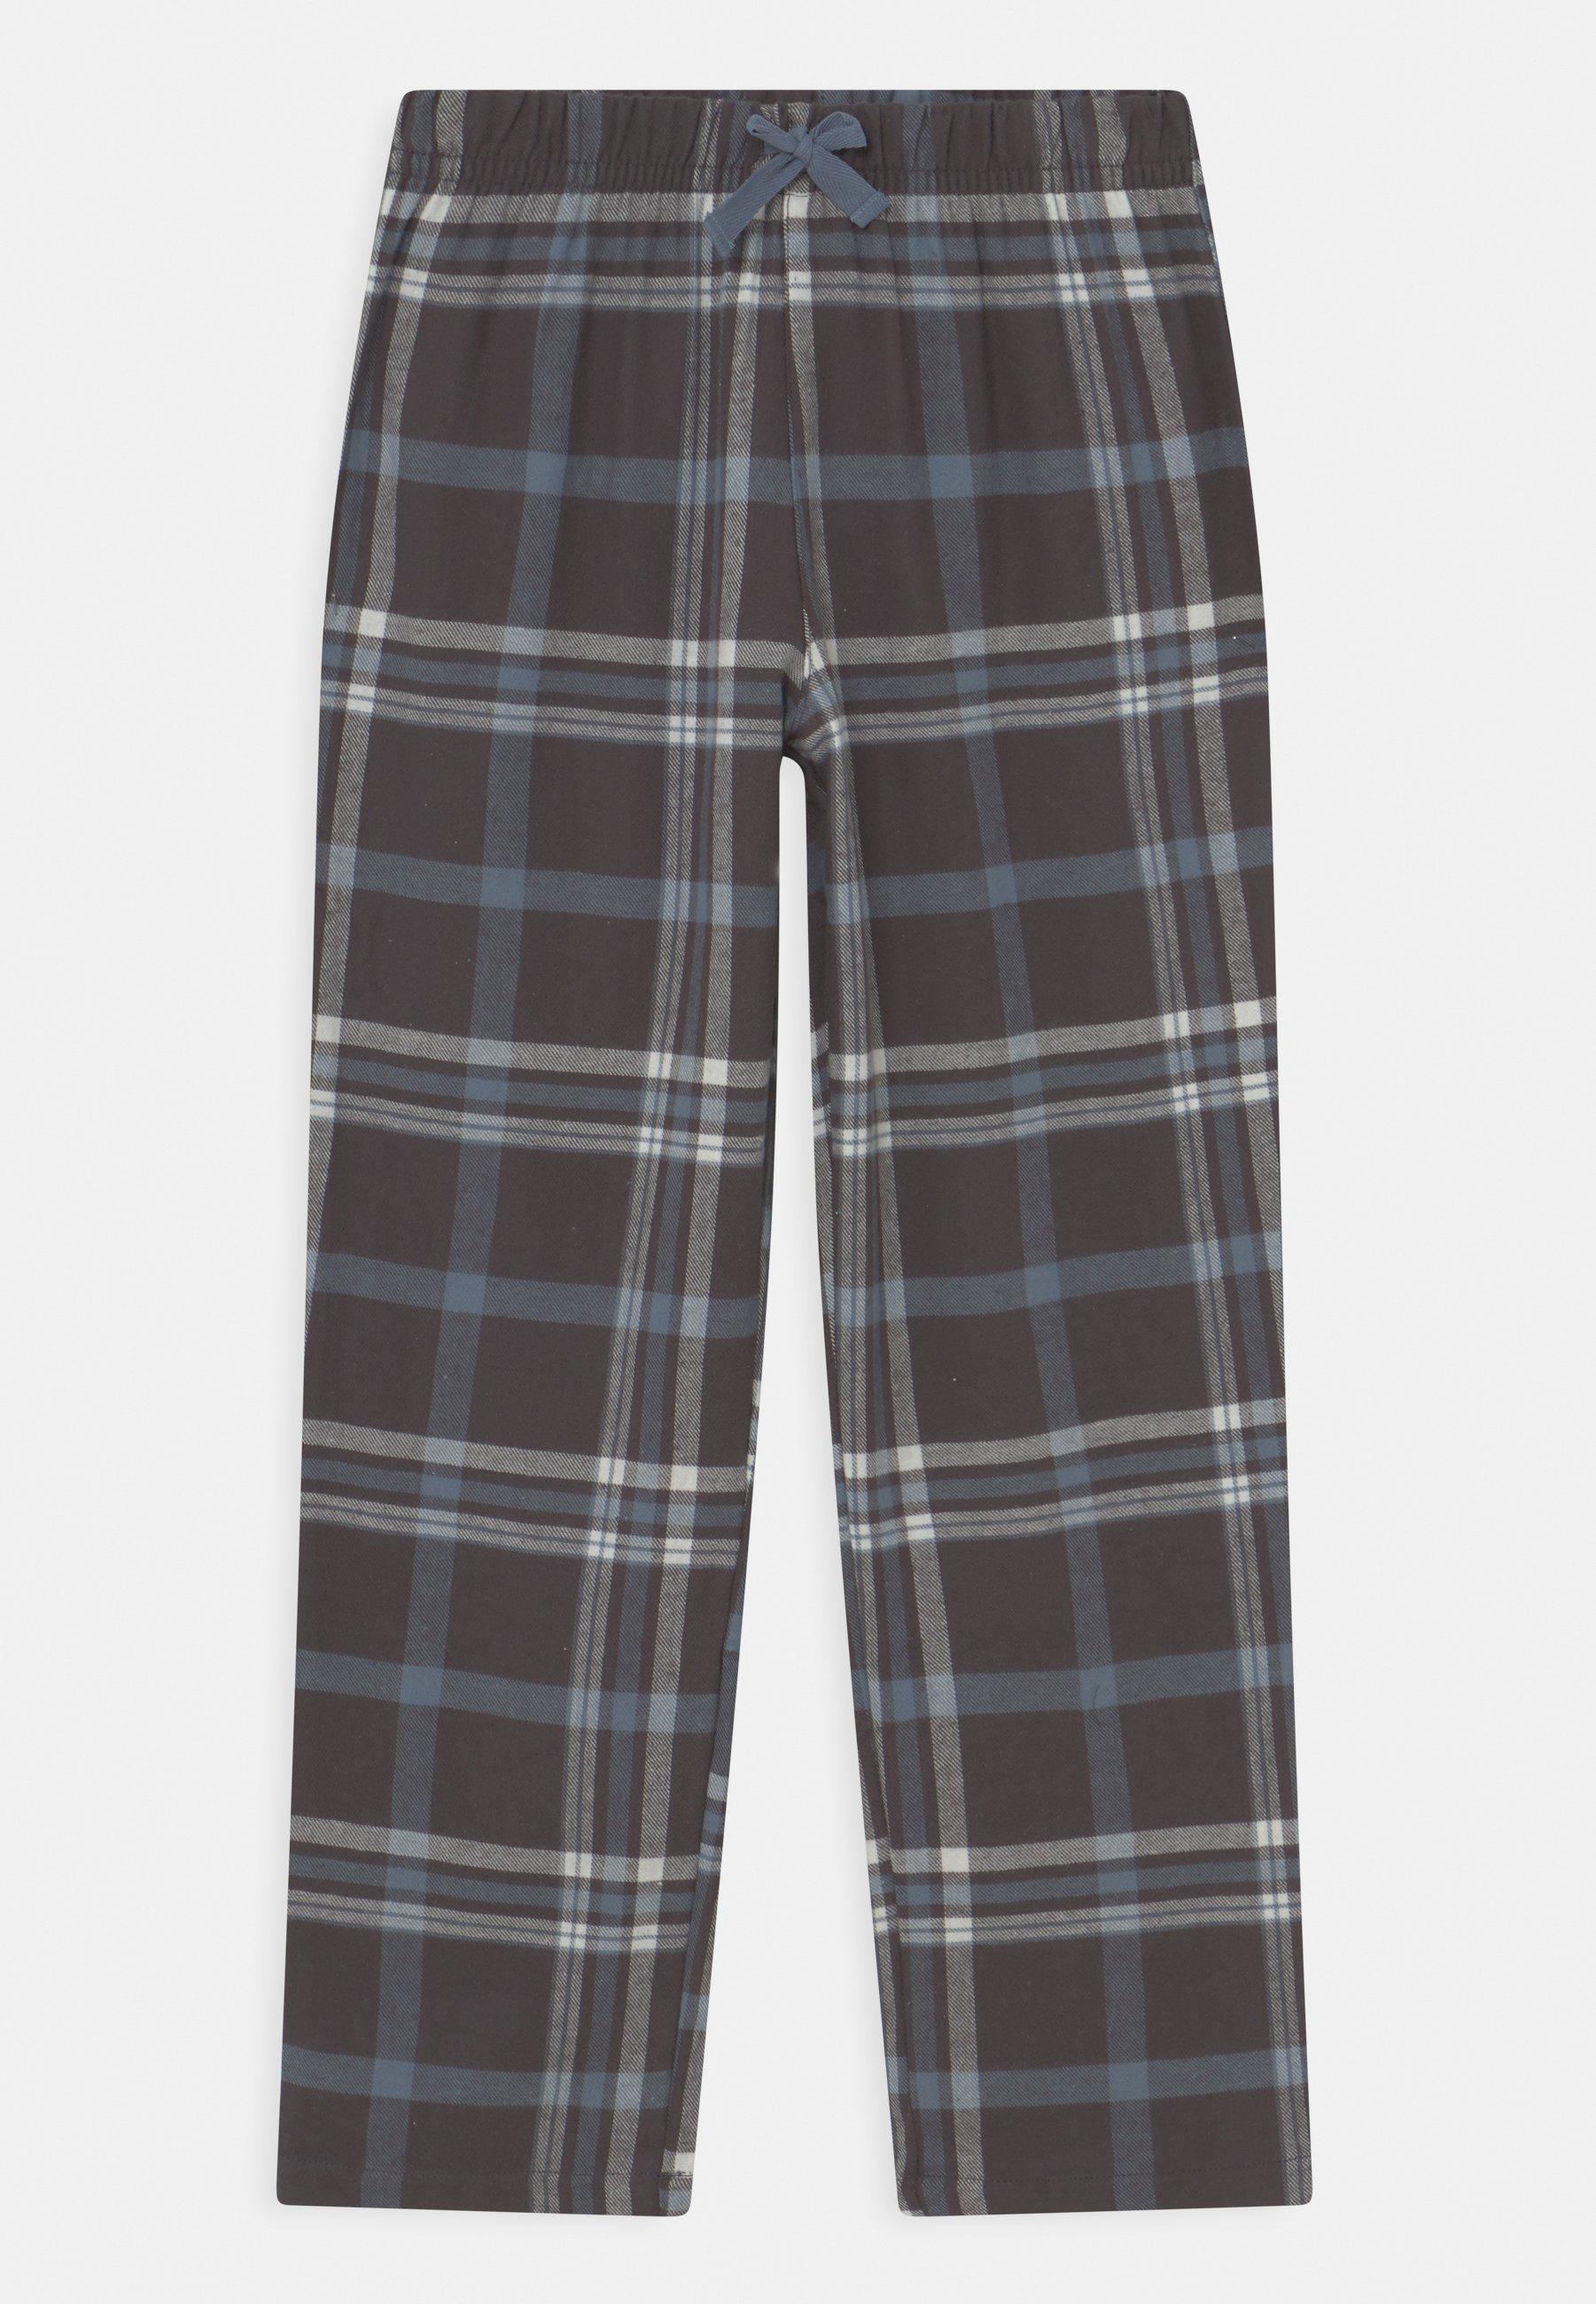 Kids PANTS LONG UNISEX - Pyjama bottoms